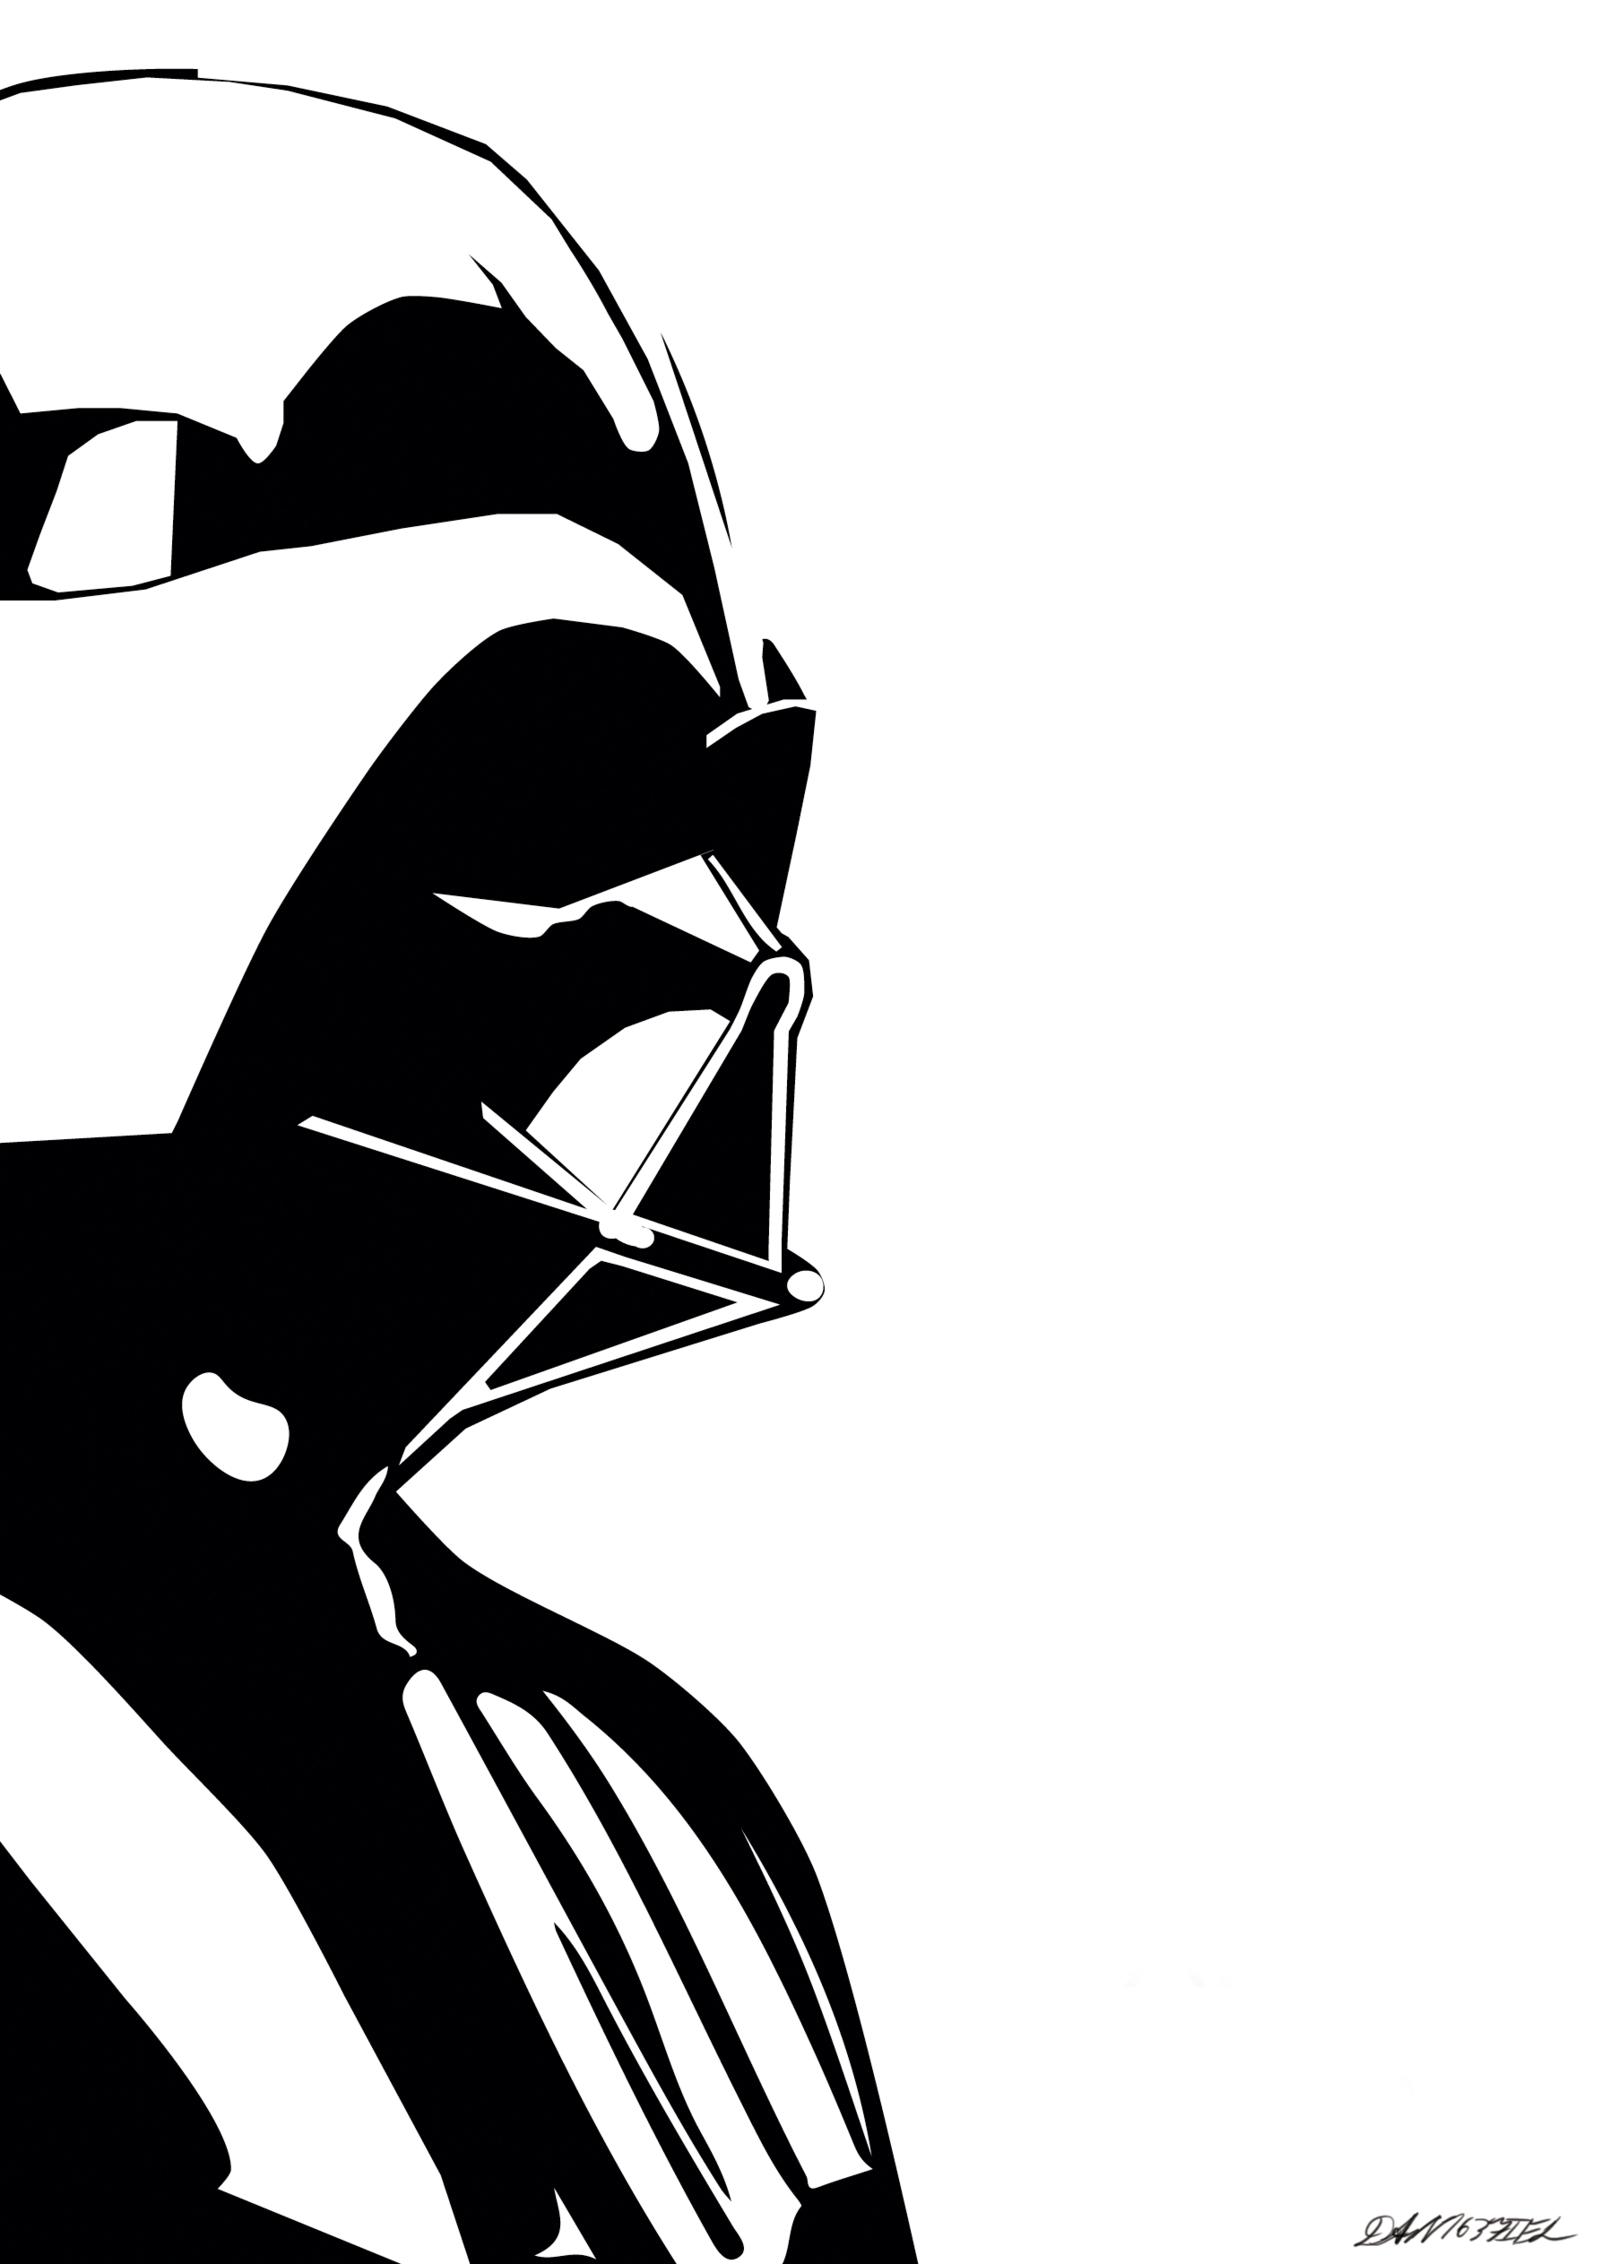 Darth Vader Minimalistic Poster Star Wars Painting Star Wars Silhouette Star Wars Stencil